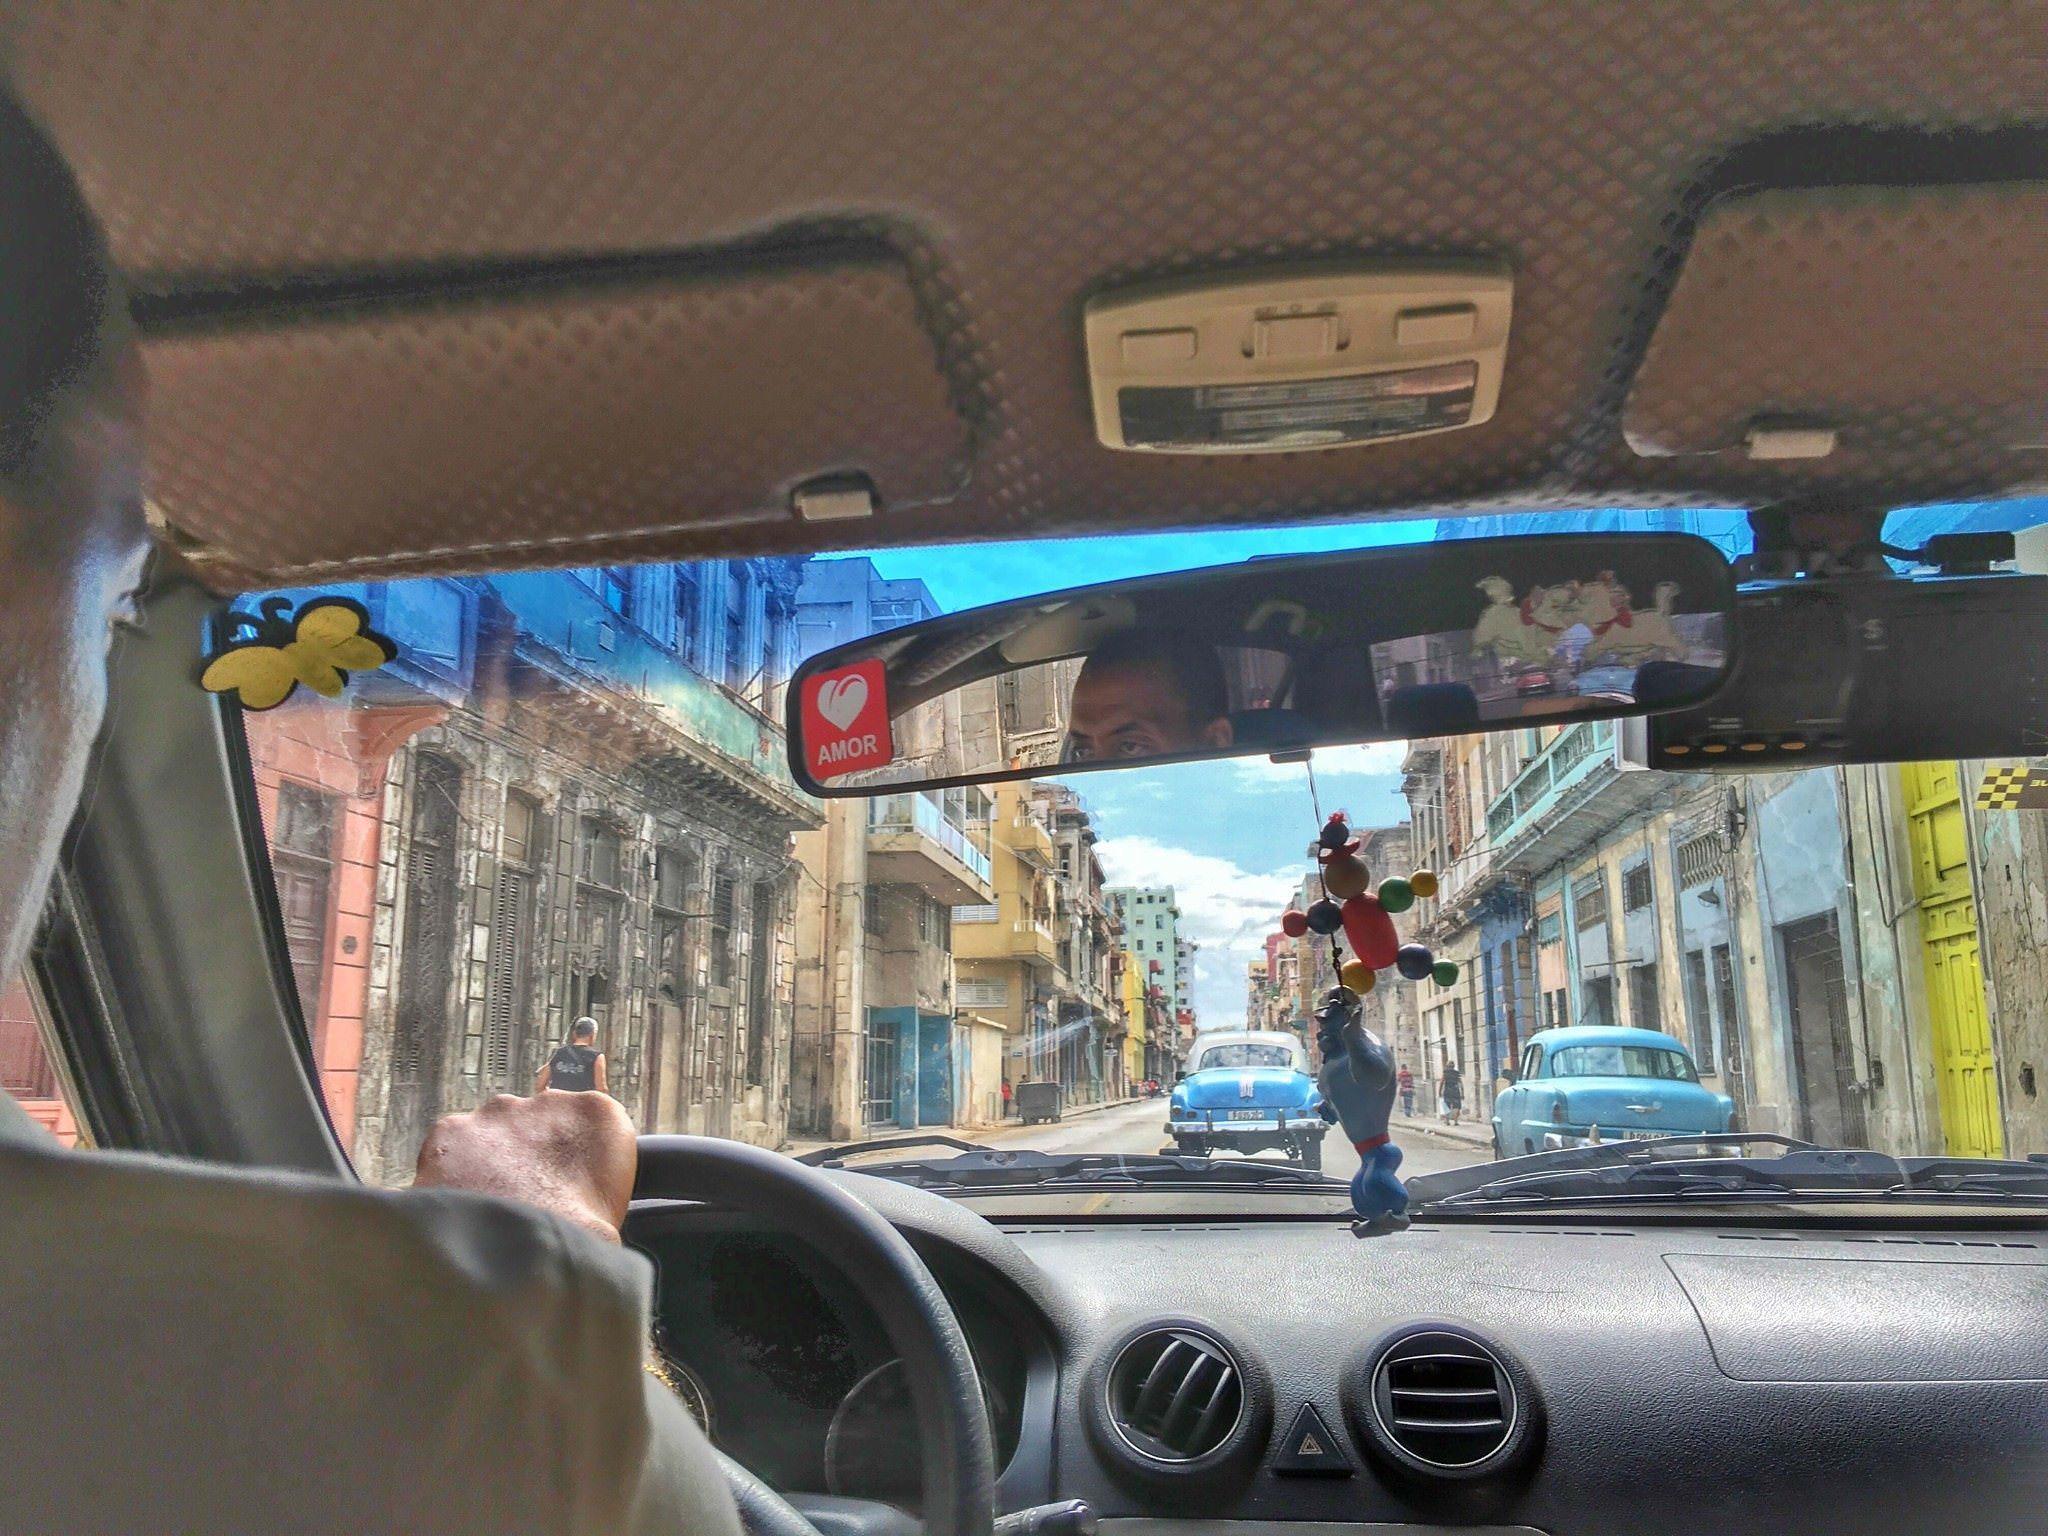 Taxi in Cuba - Cuba Travel Guide